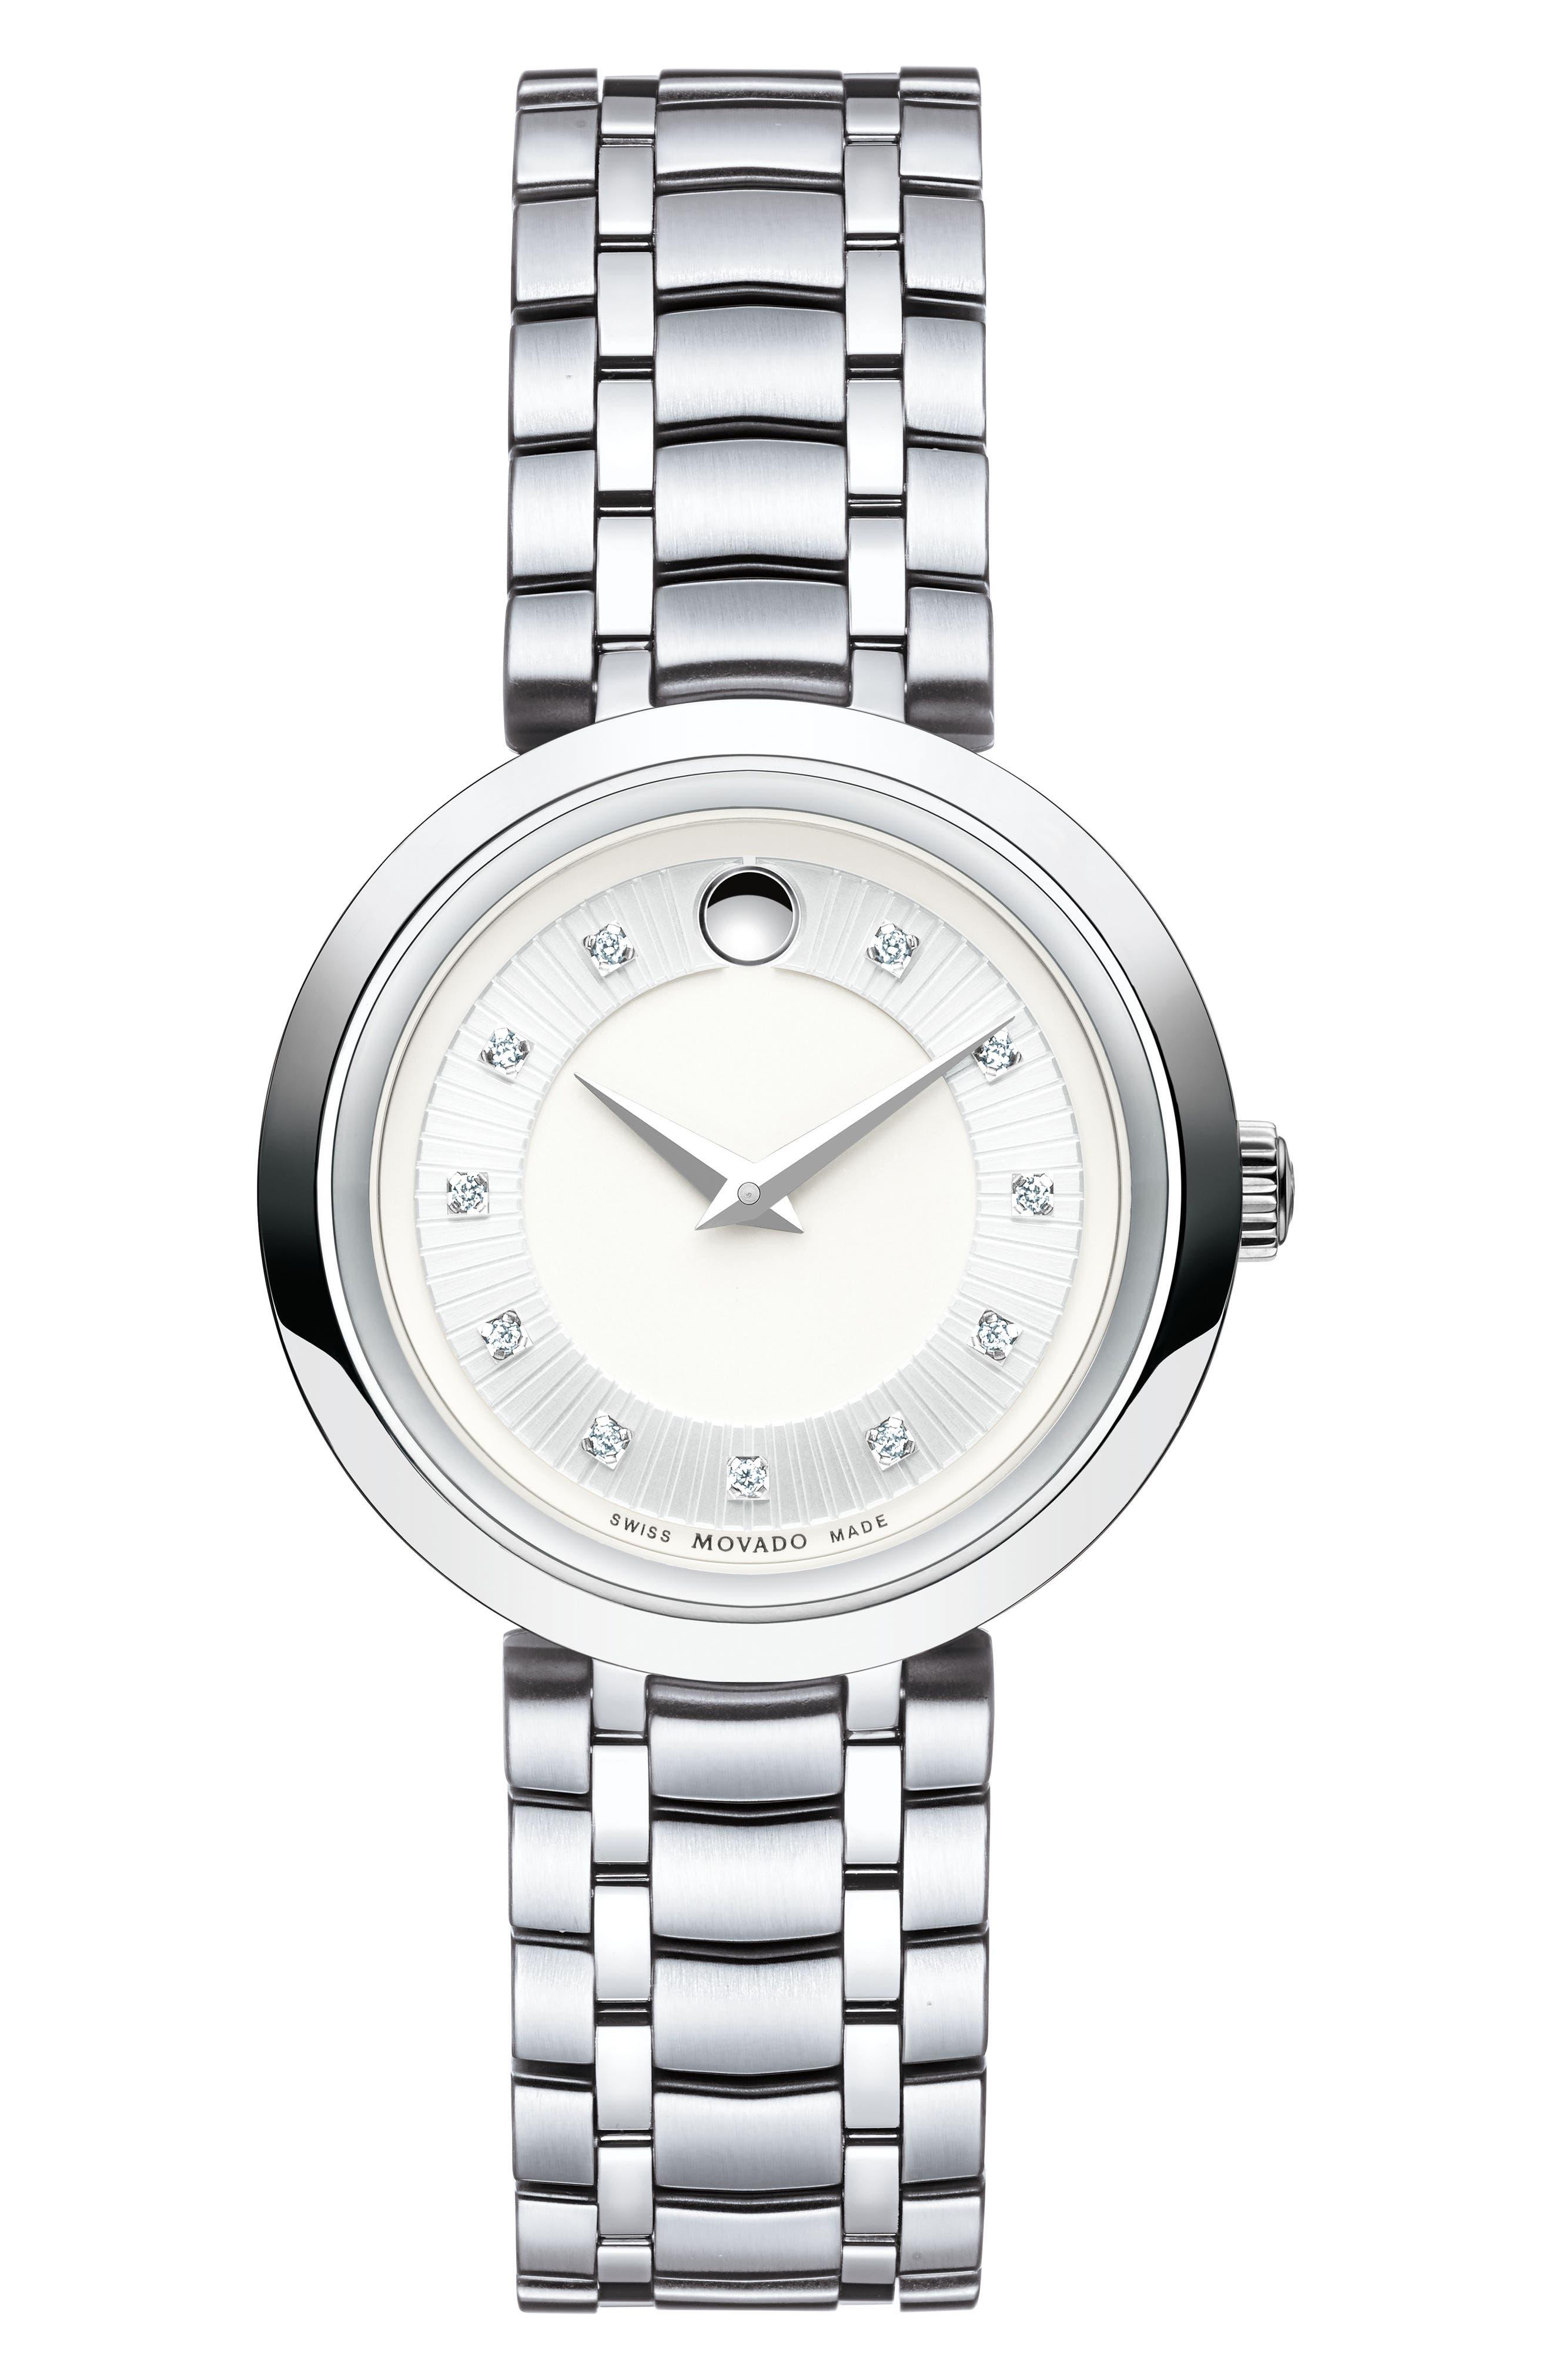 Main Image - Movado 1881 Diamond Bracelet Watch, 28mm